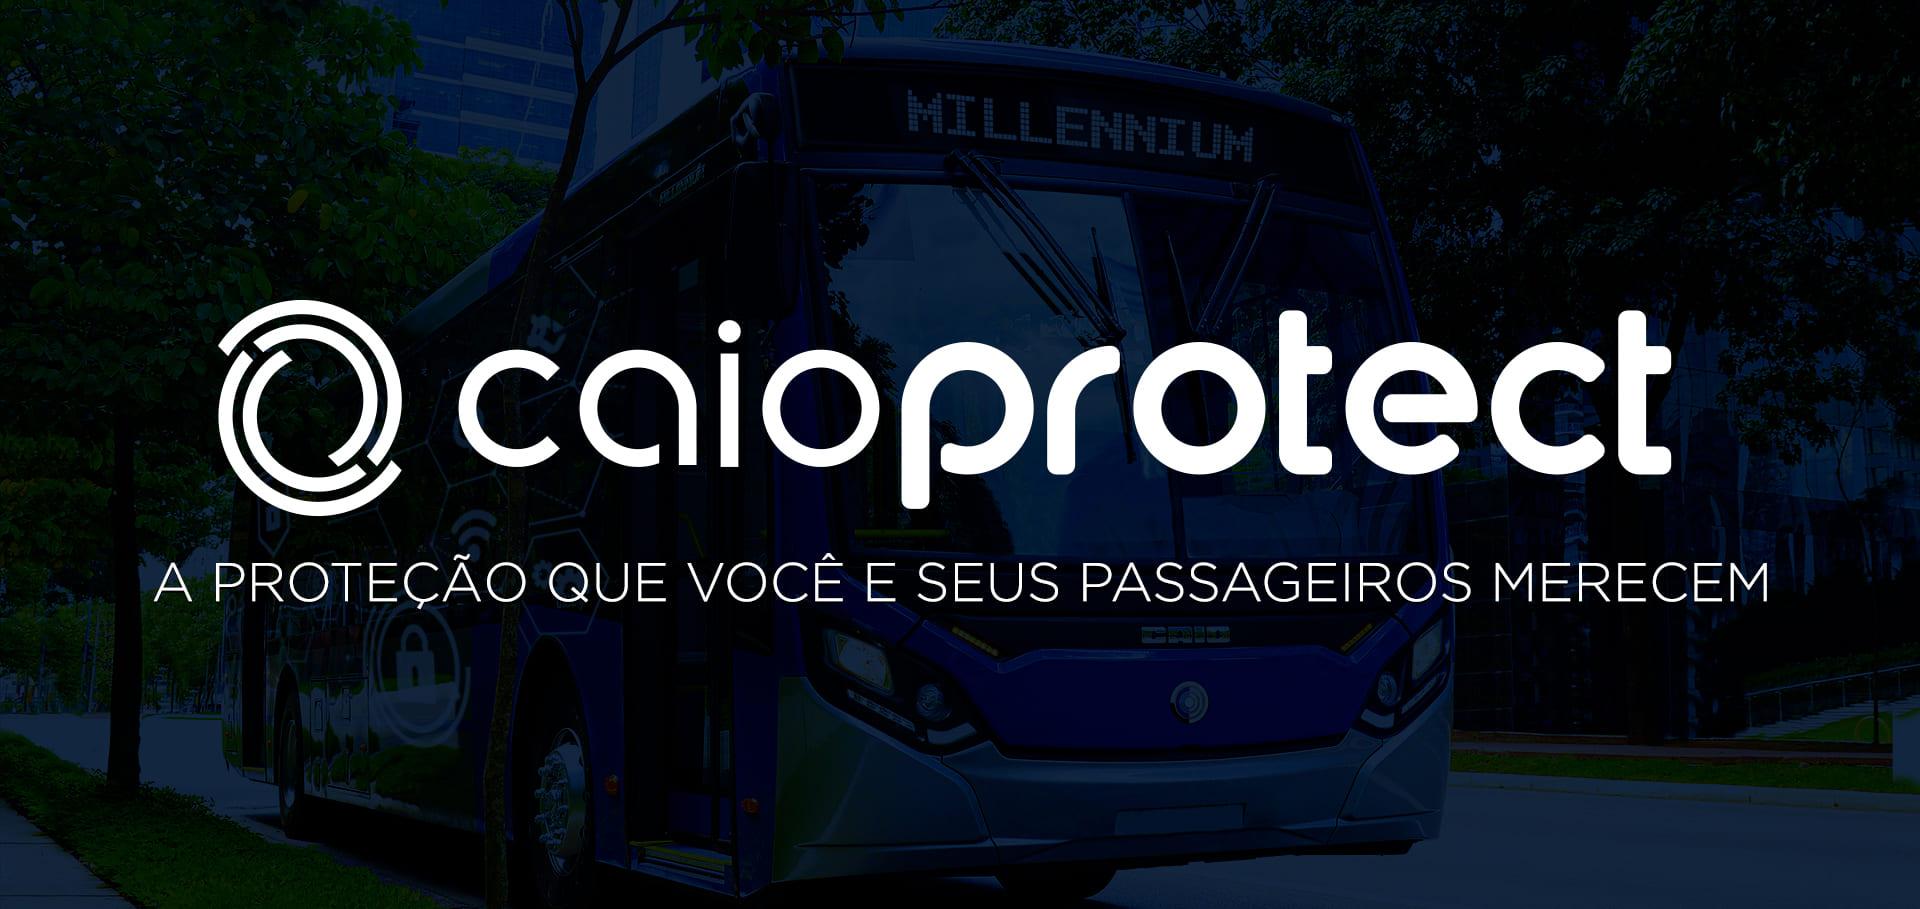 Caio Protect